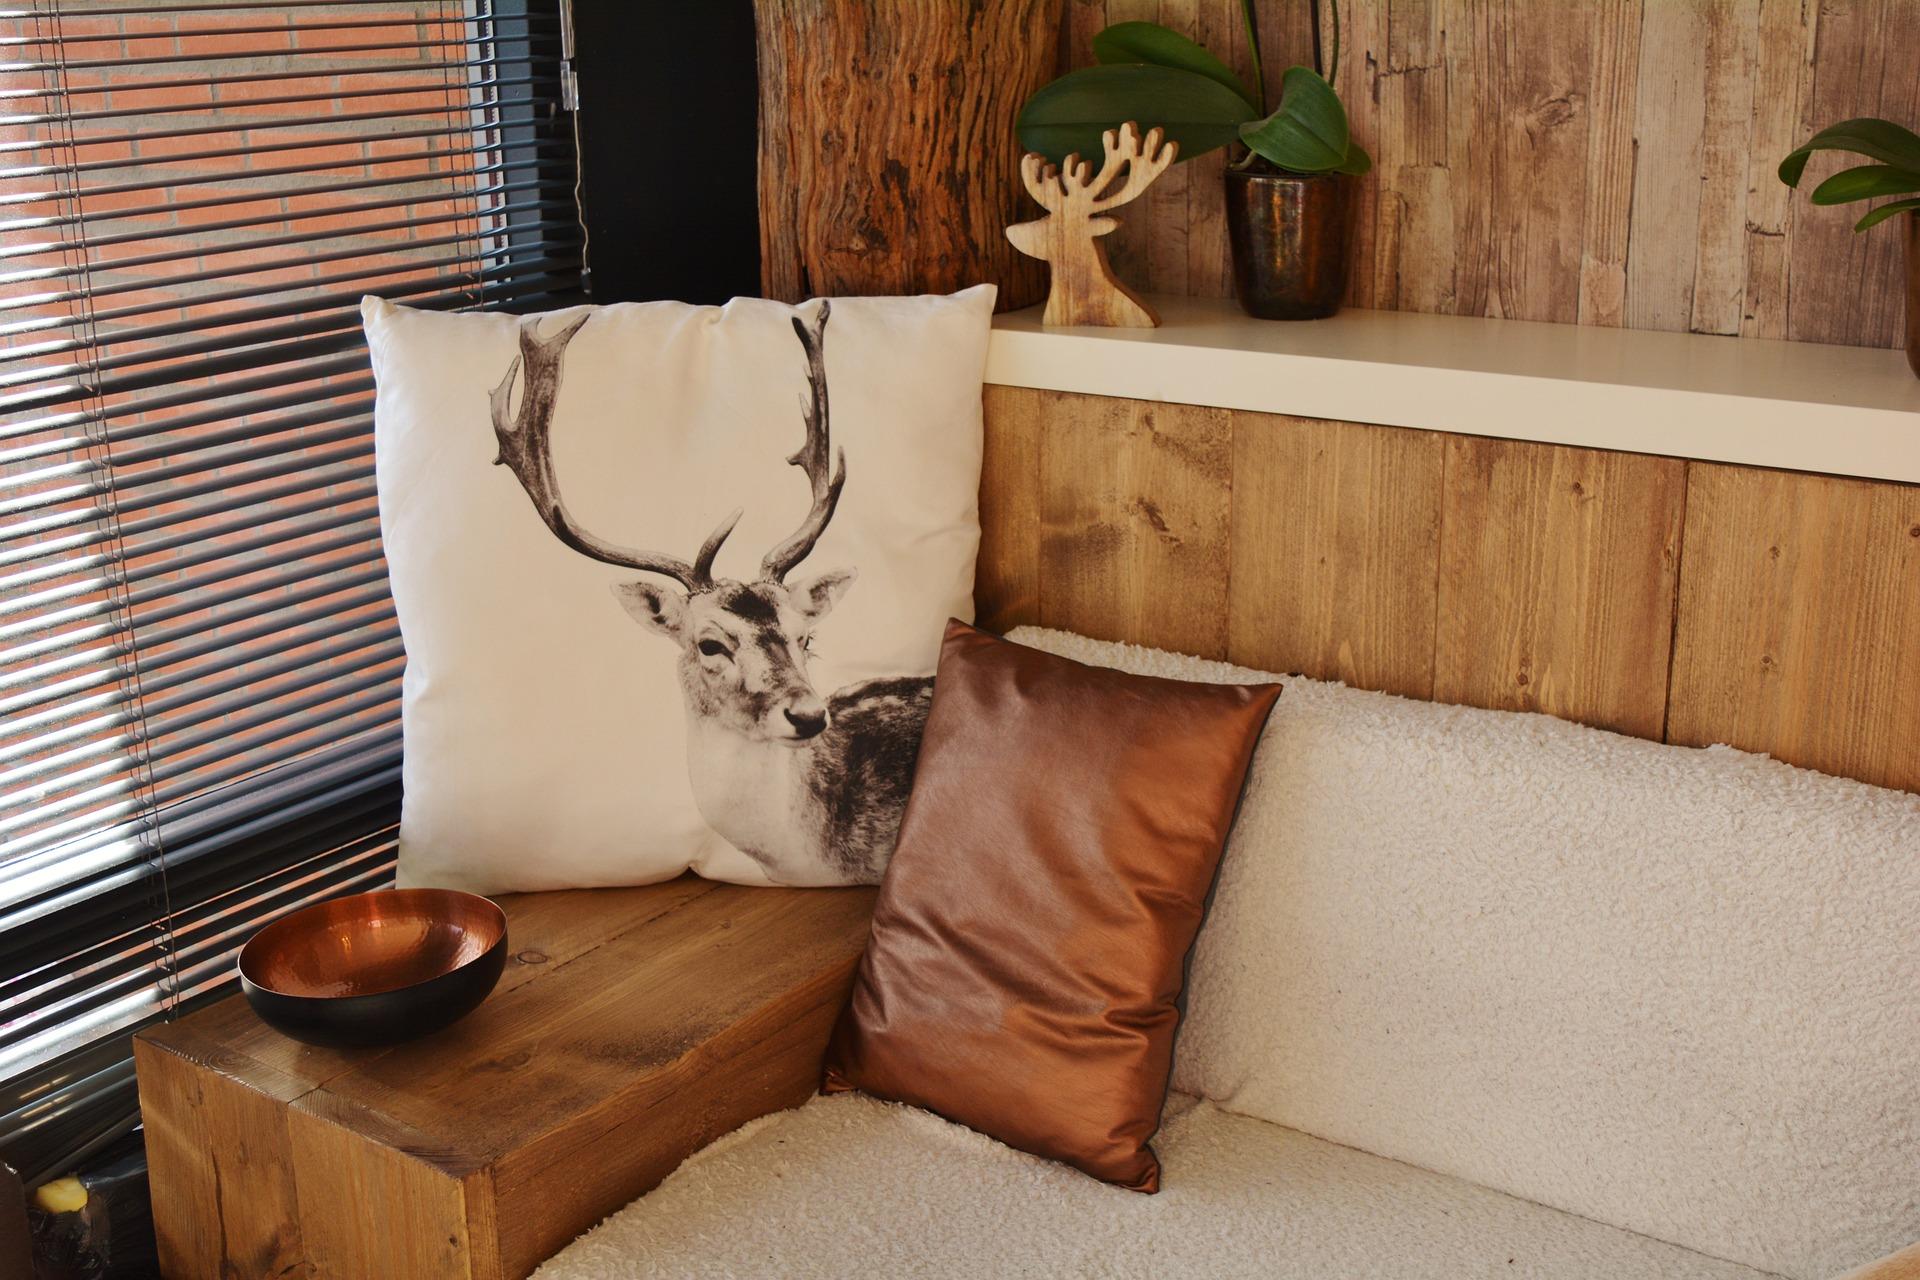 Image: Wooden atmosphere via Shutterstock